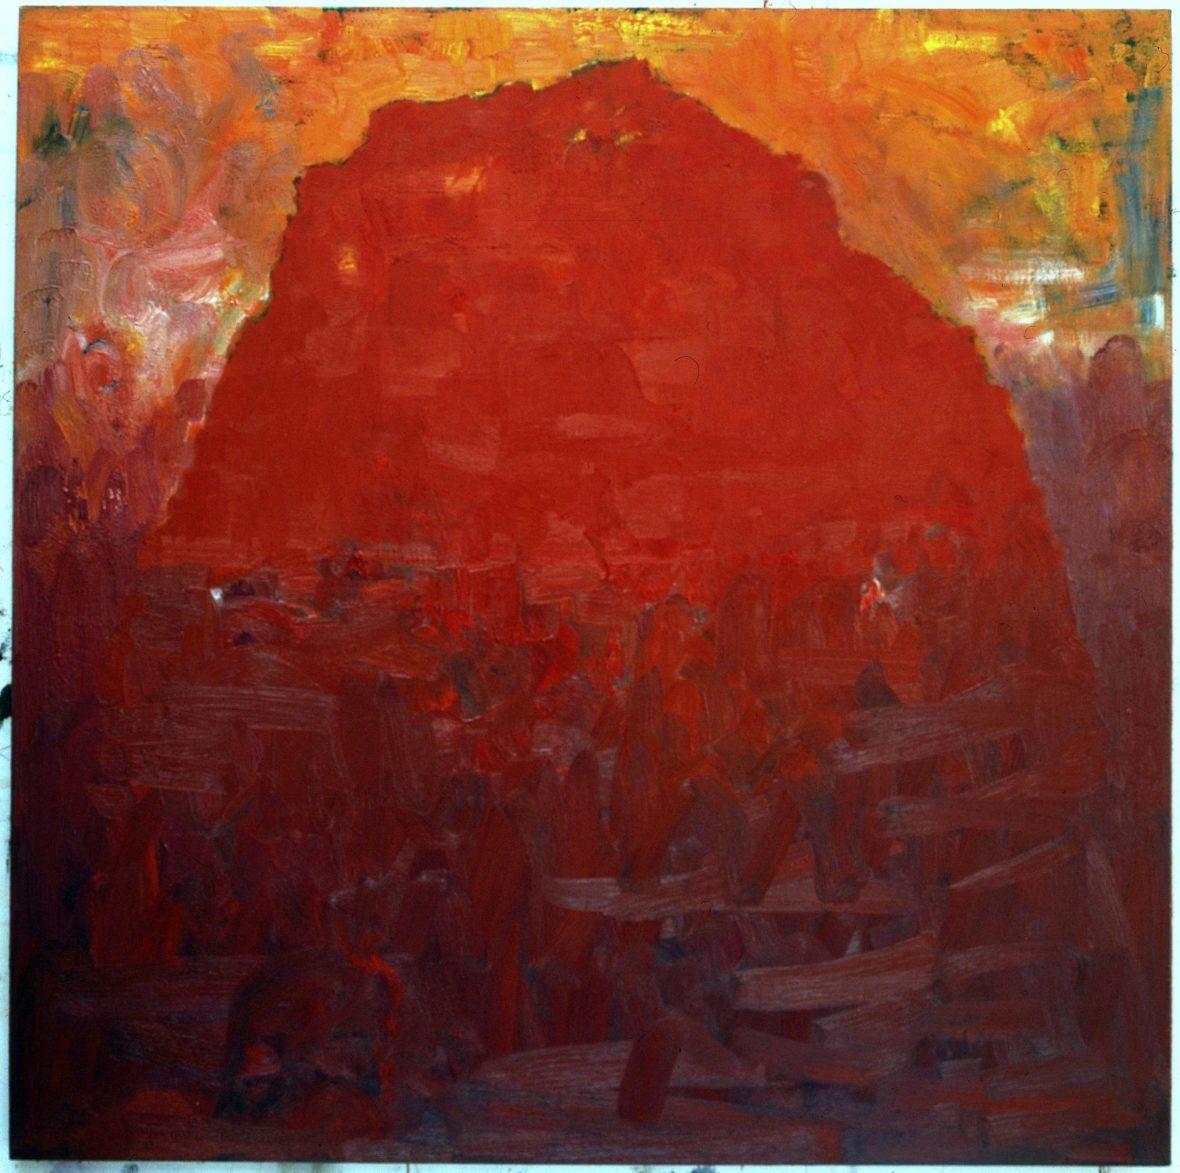 Punainen vuori